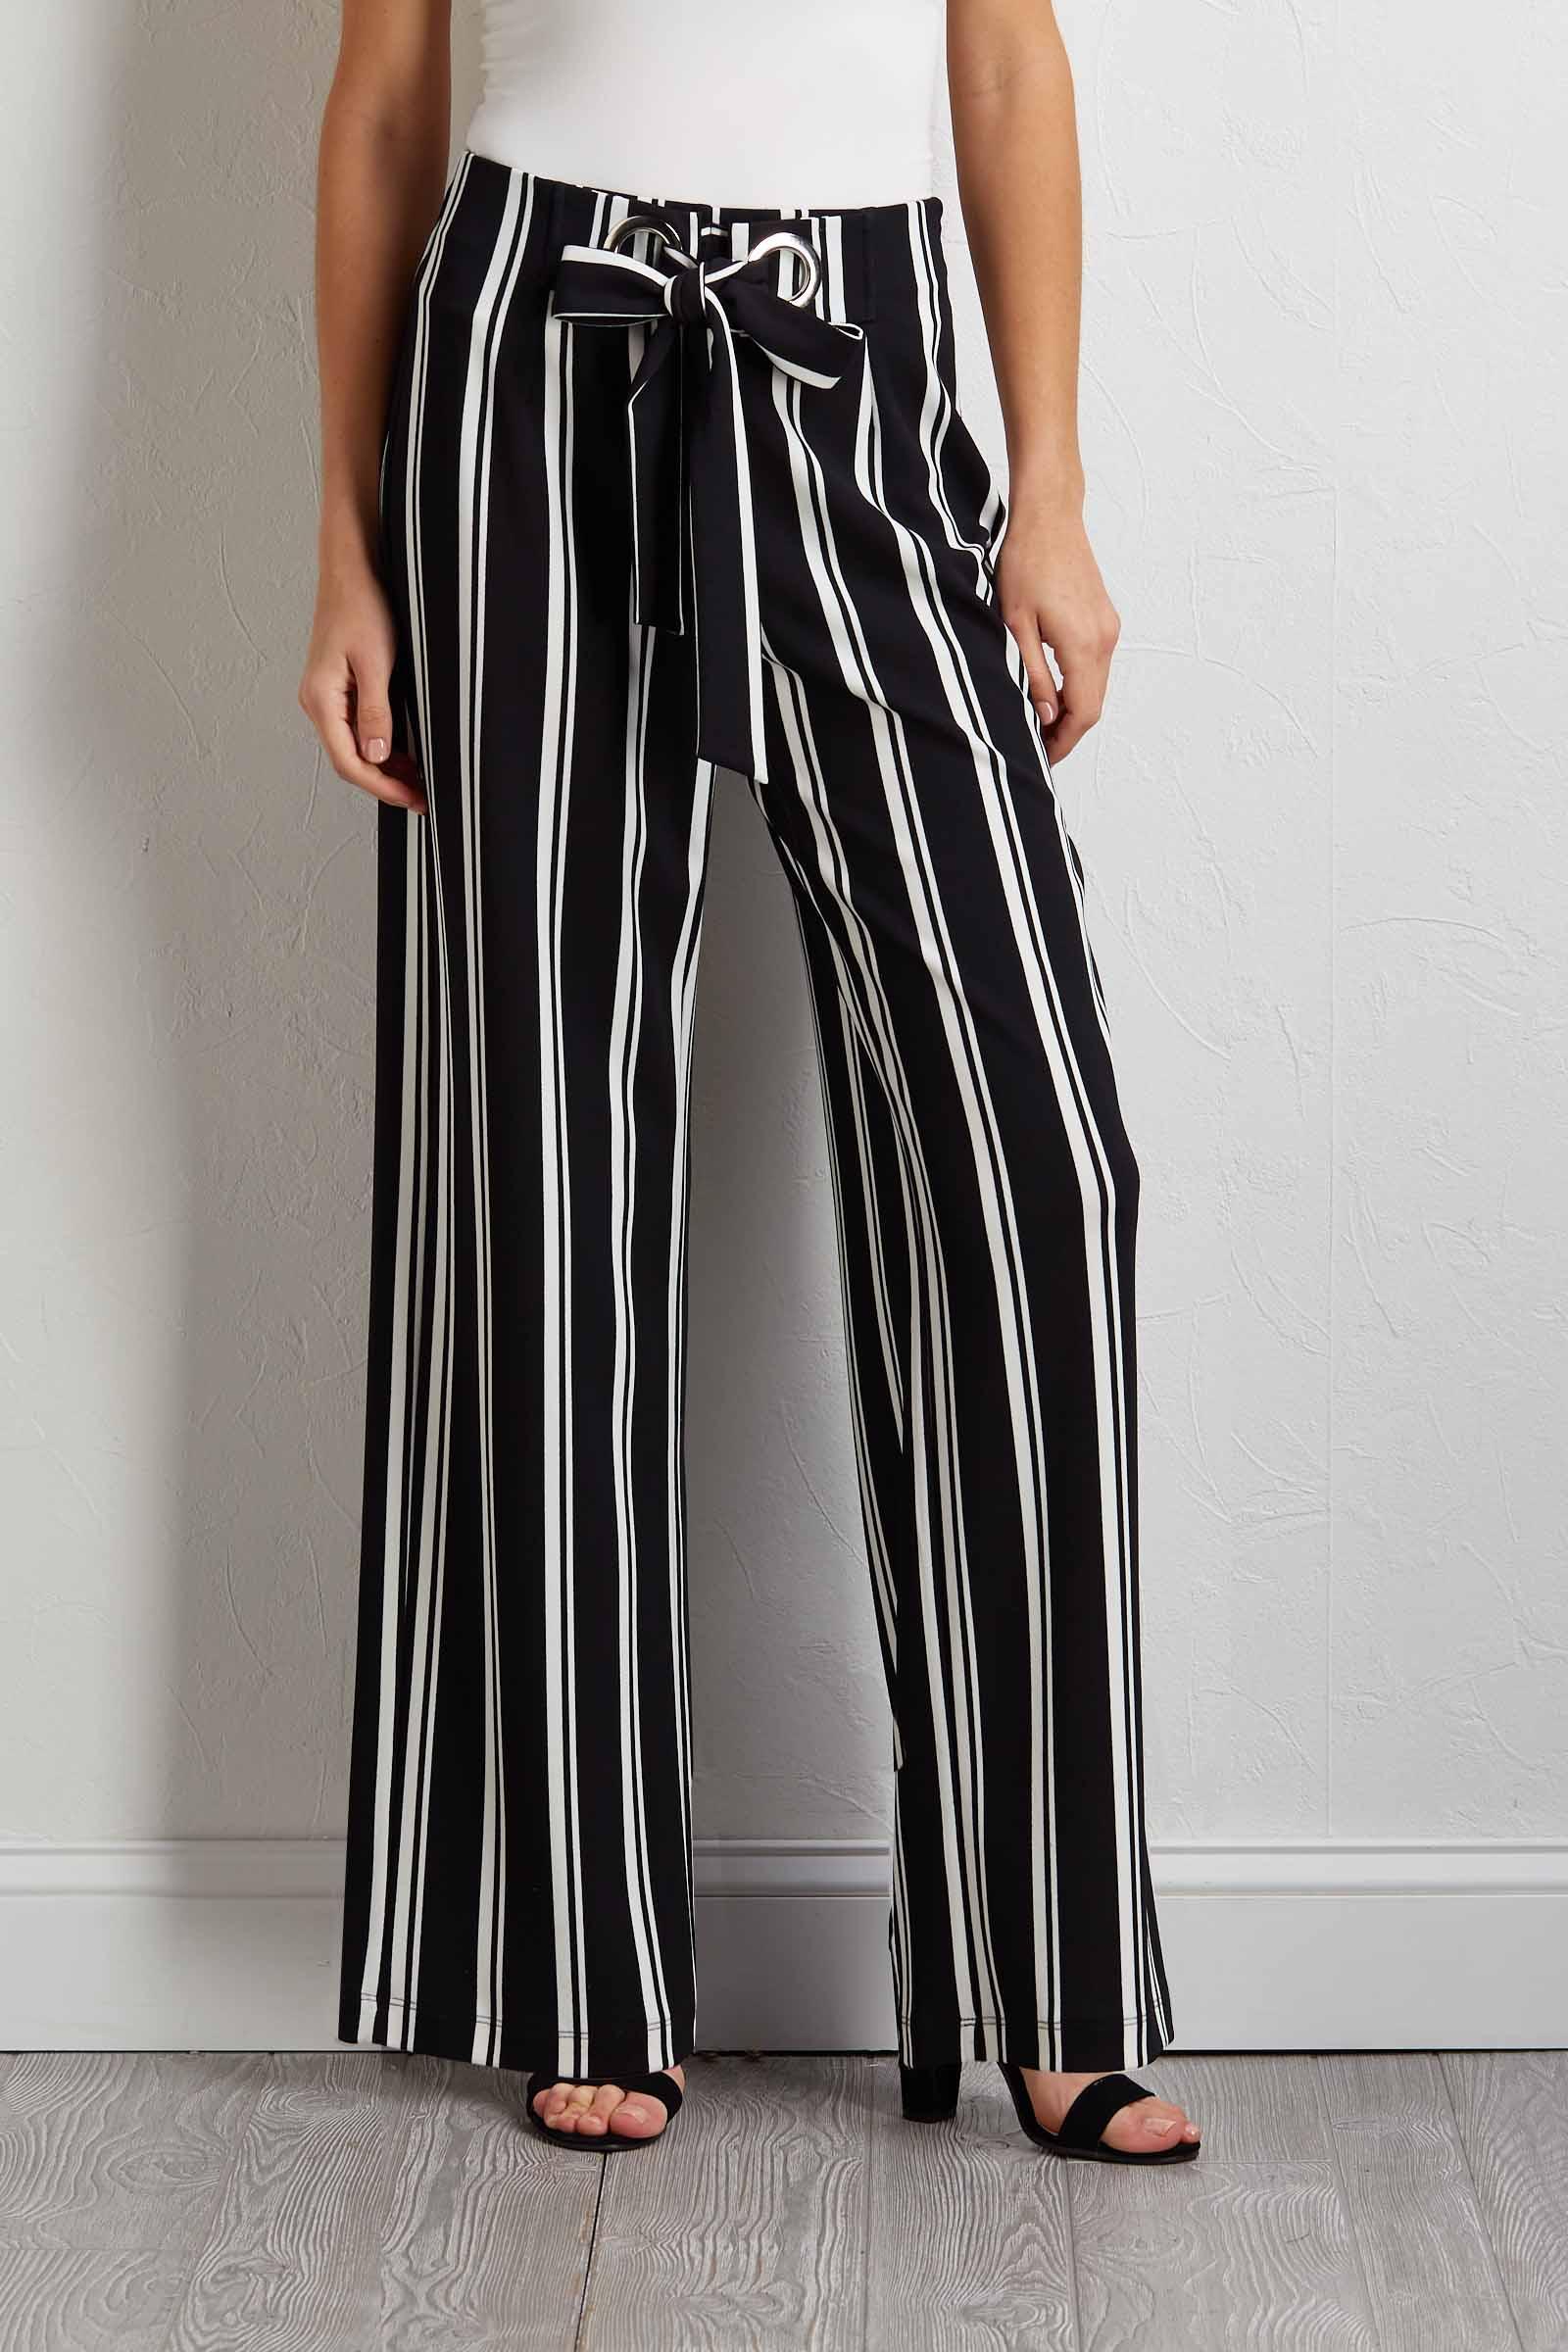 Striped Grommet Tie Pants